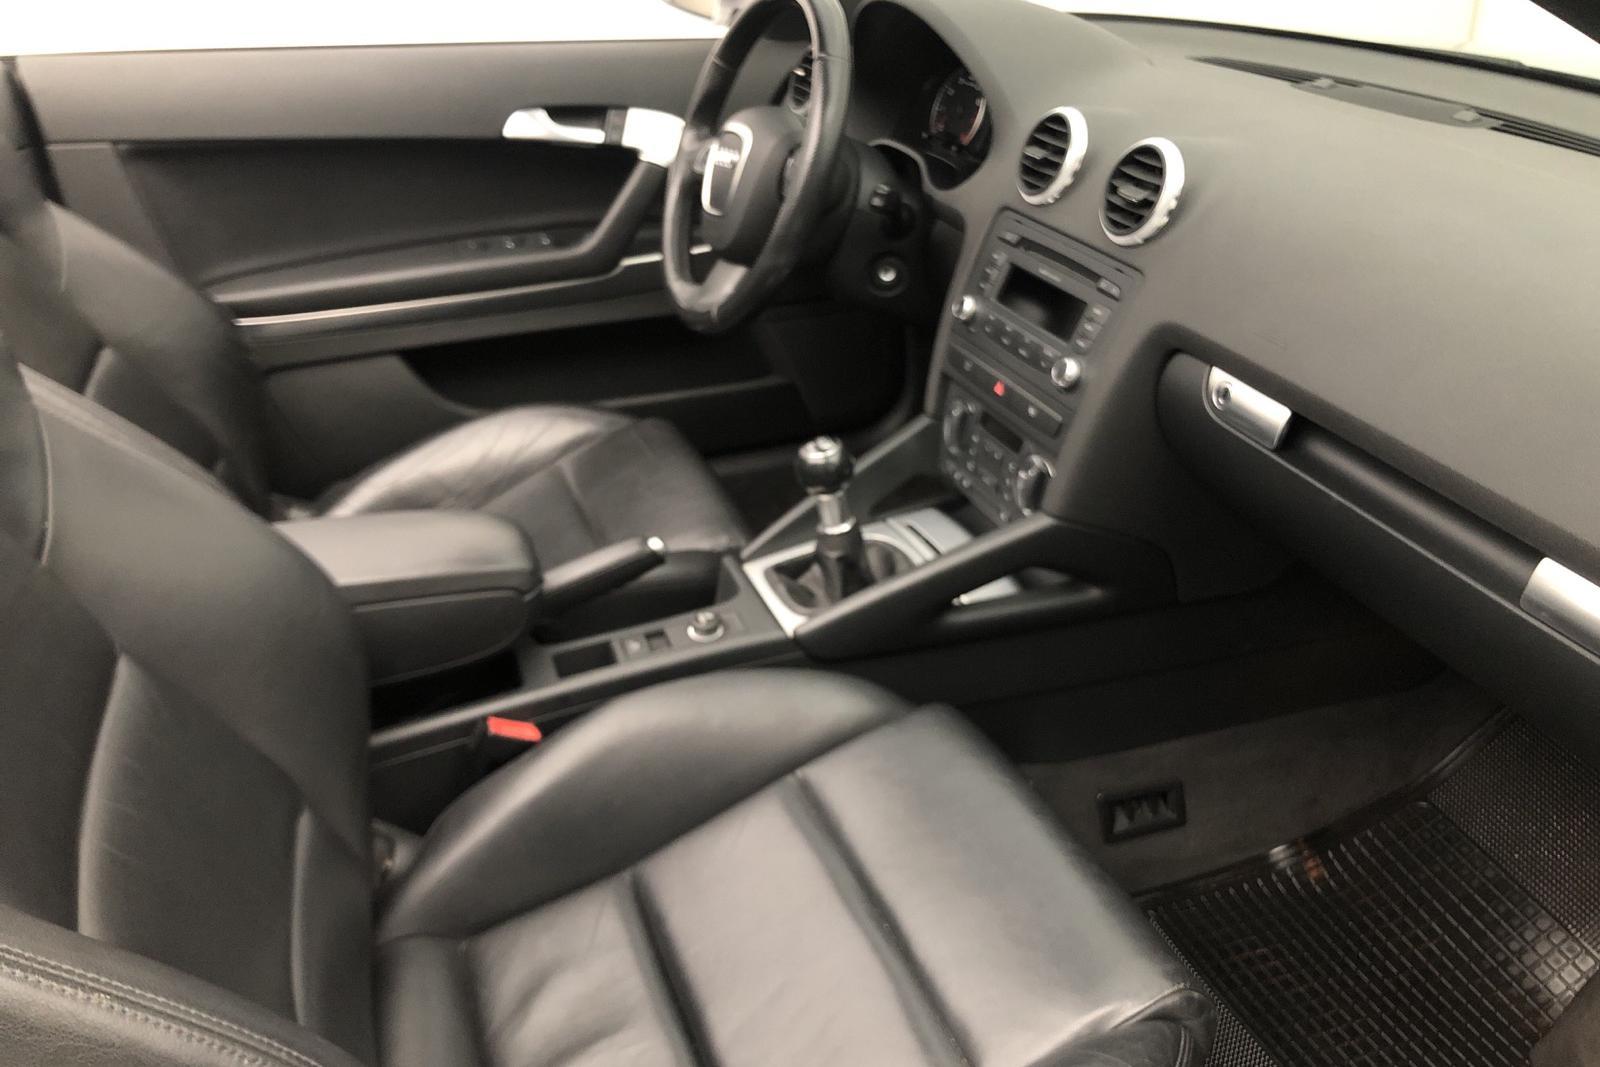 Audi A3 1.8 TFSI Cabriolet (160hk) - 123 000 km - Manual - silver - 2008